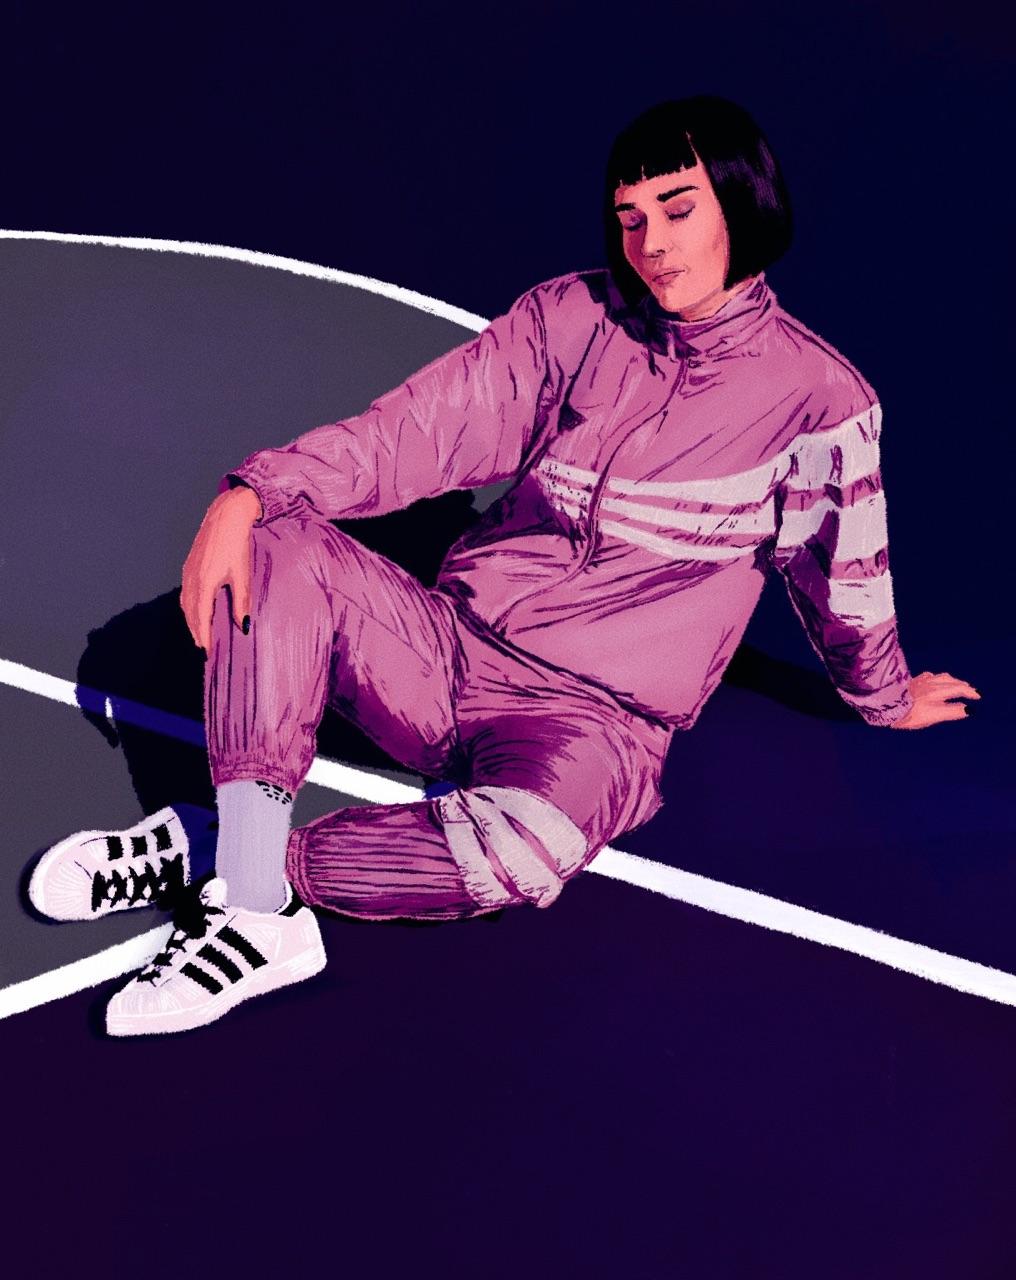 Illustration of model, Armela Jakove for foot locker with a dark blue background